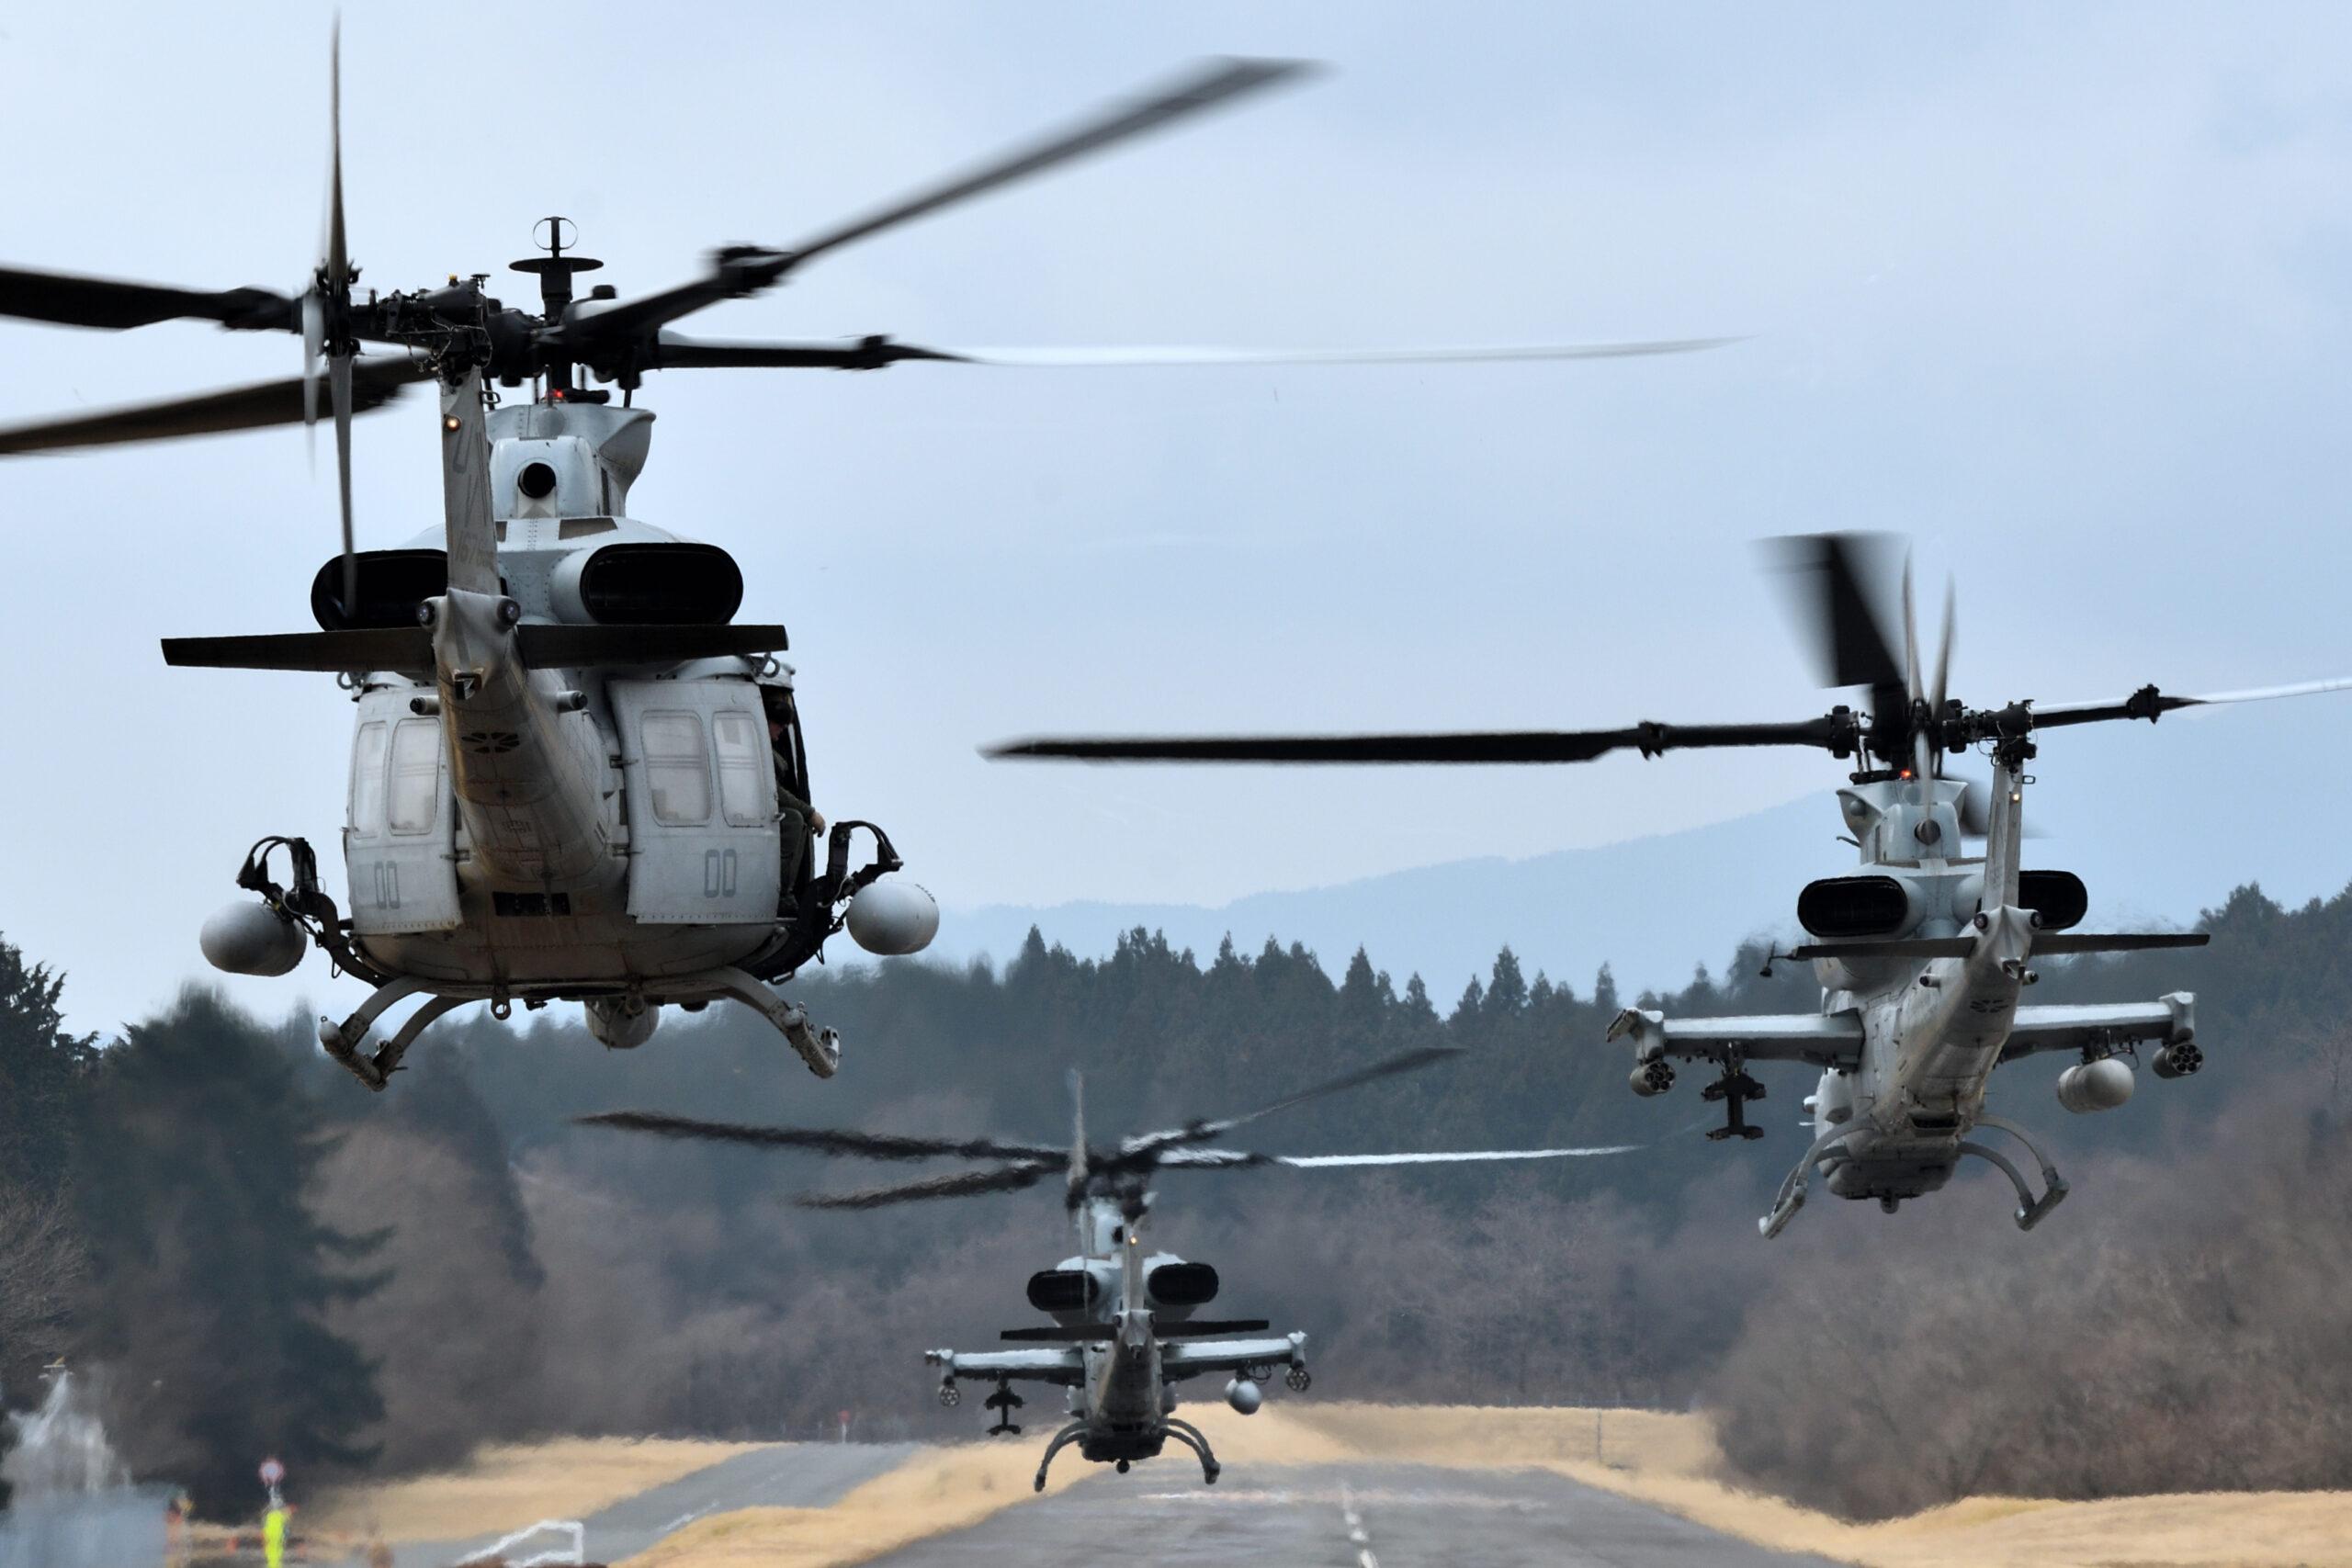 Aerospace development helicopter rotors